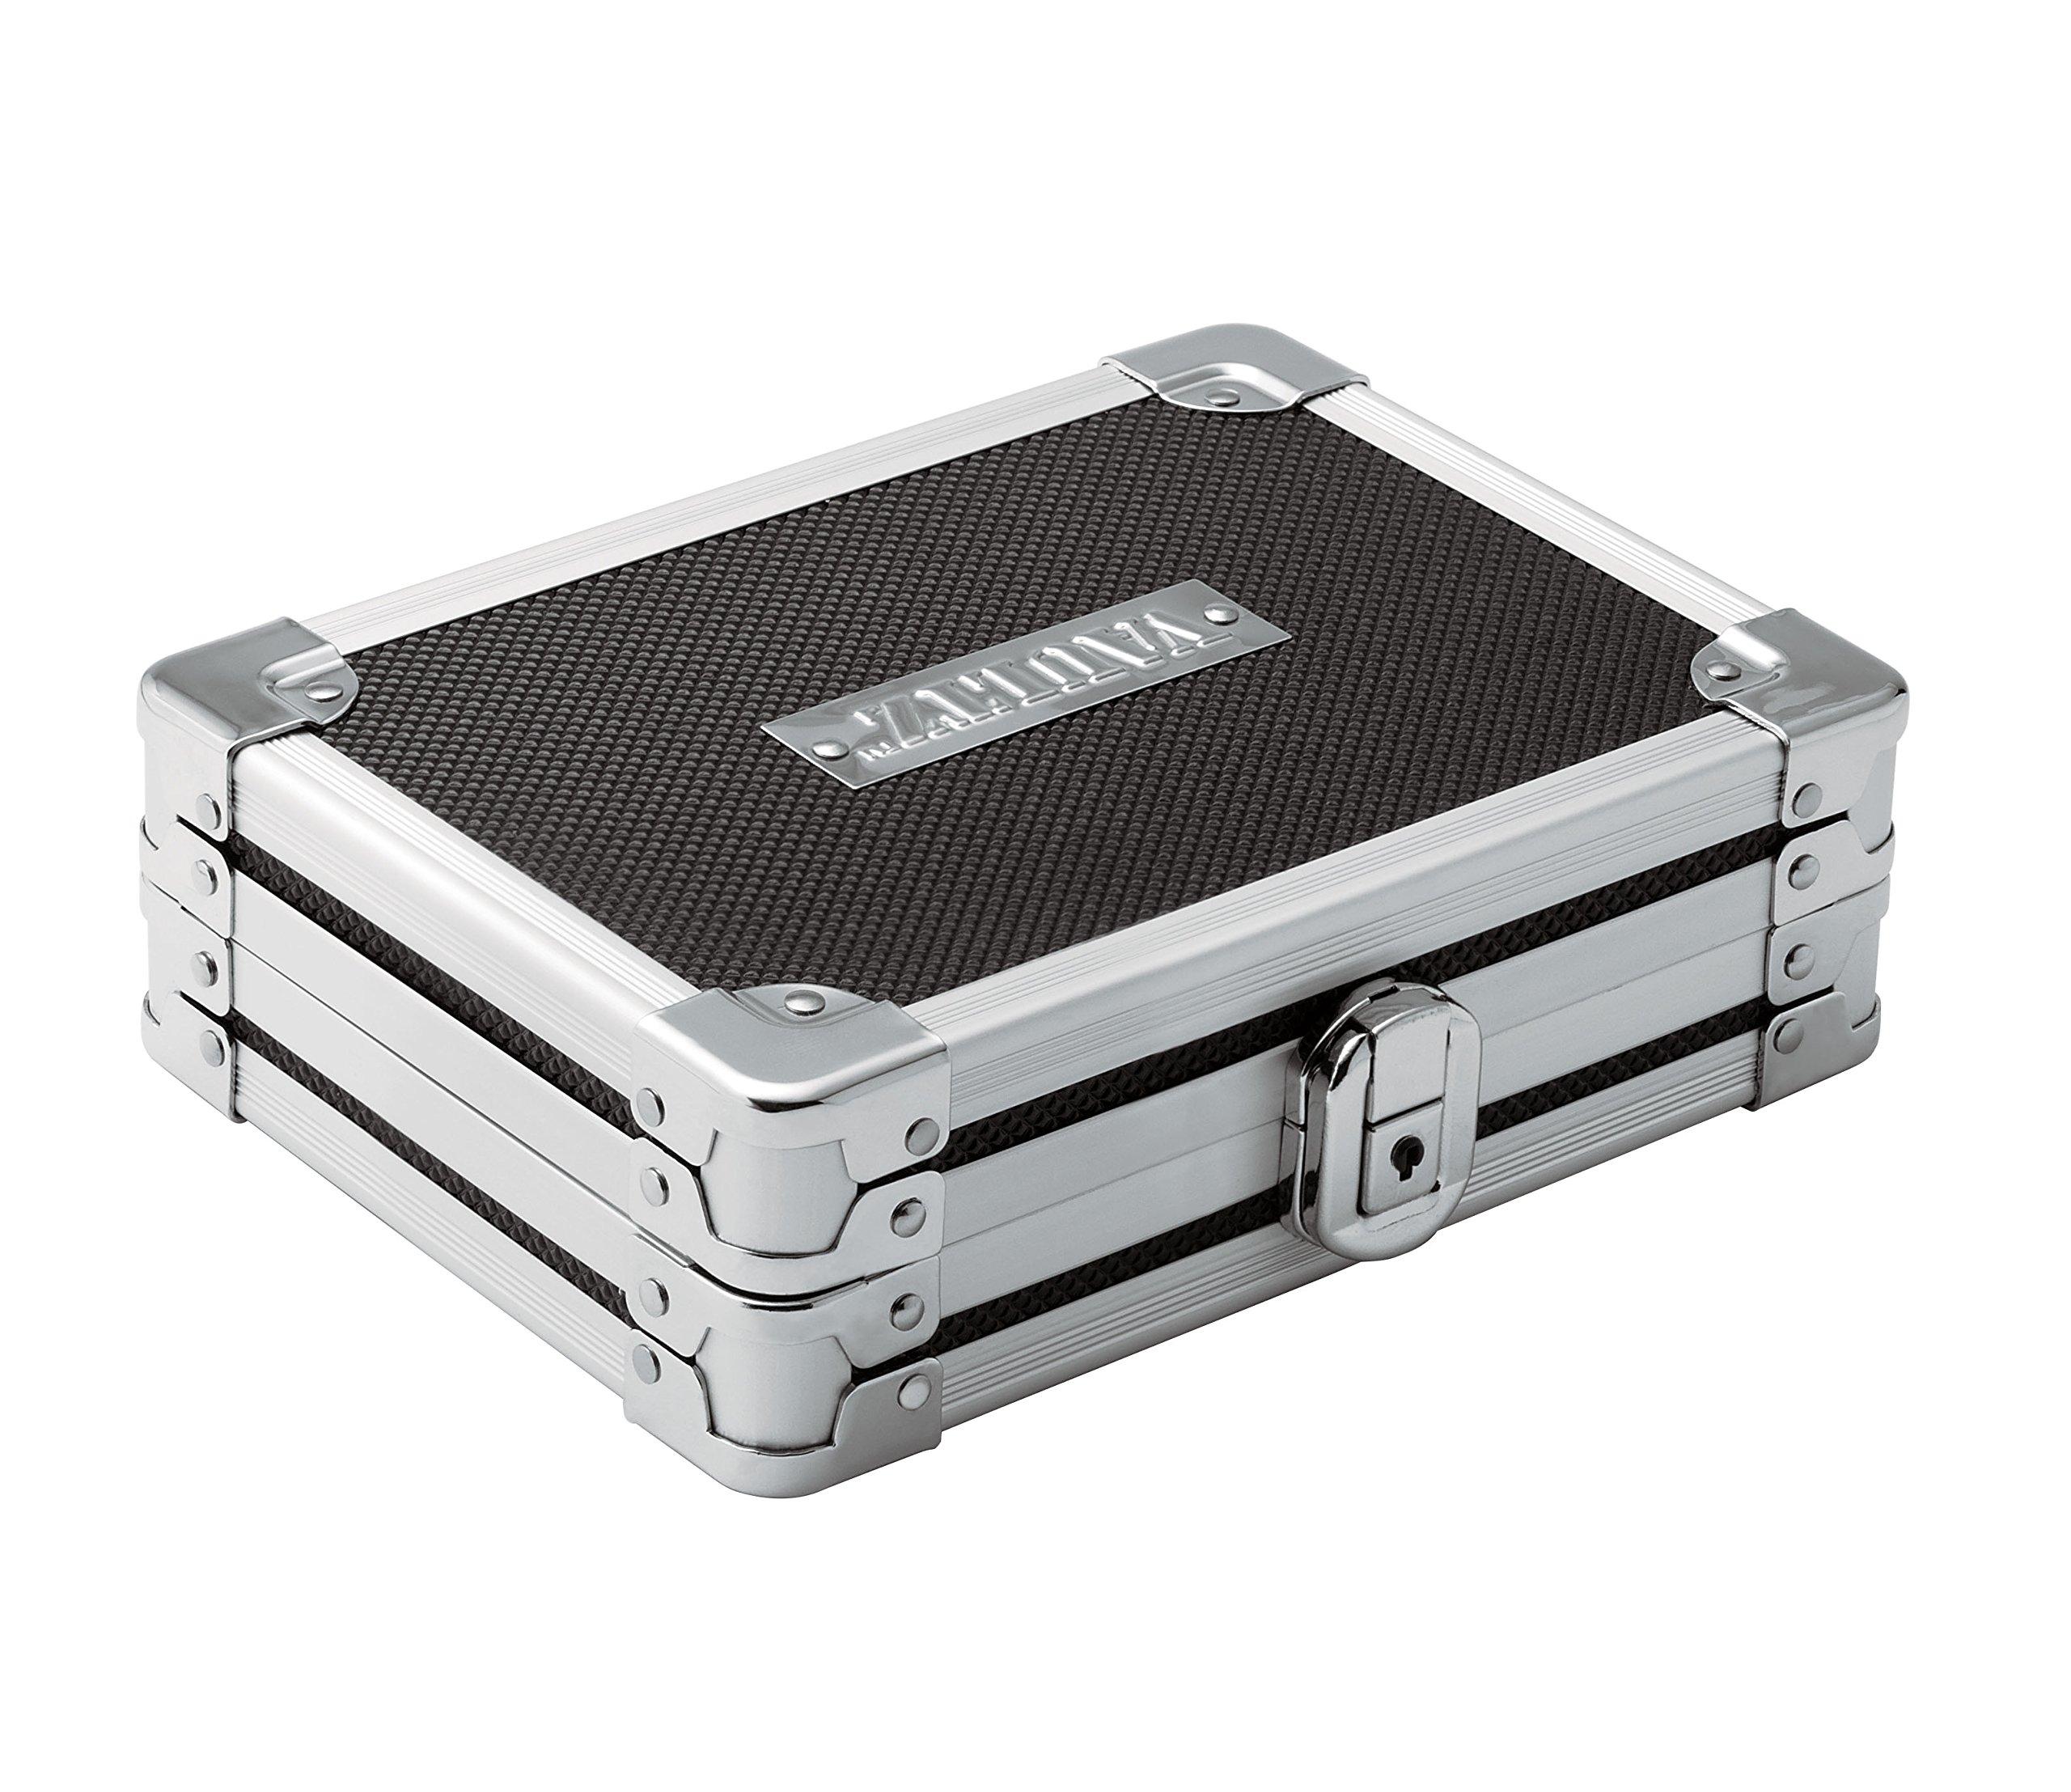 Vaultz Locking Gadget Box, Black with Chrome Accents, 5.5 x 8.25 x 2.25 Inch - Exterior Dimensions (VZ01269)